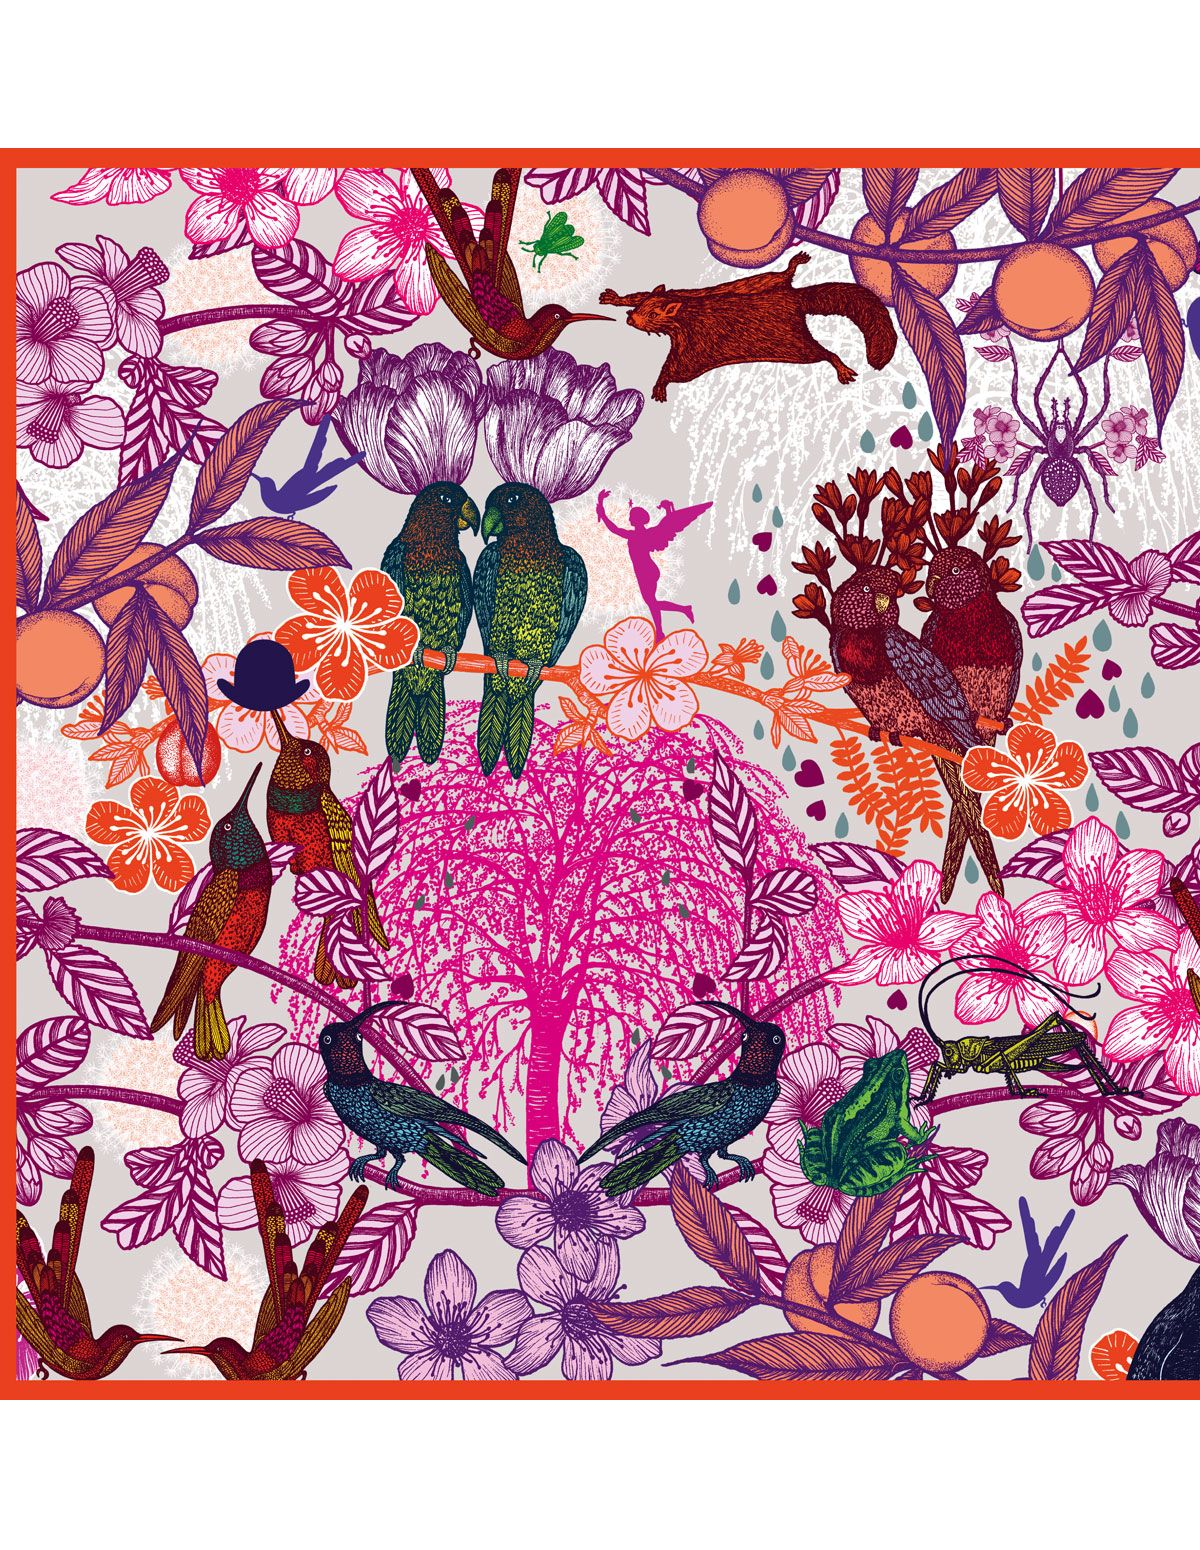 Papier Peint Mars Issu Du Livre Merveilleuse Nature 현대 미술 놀라운 디자인